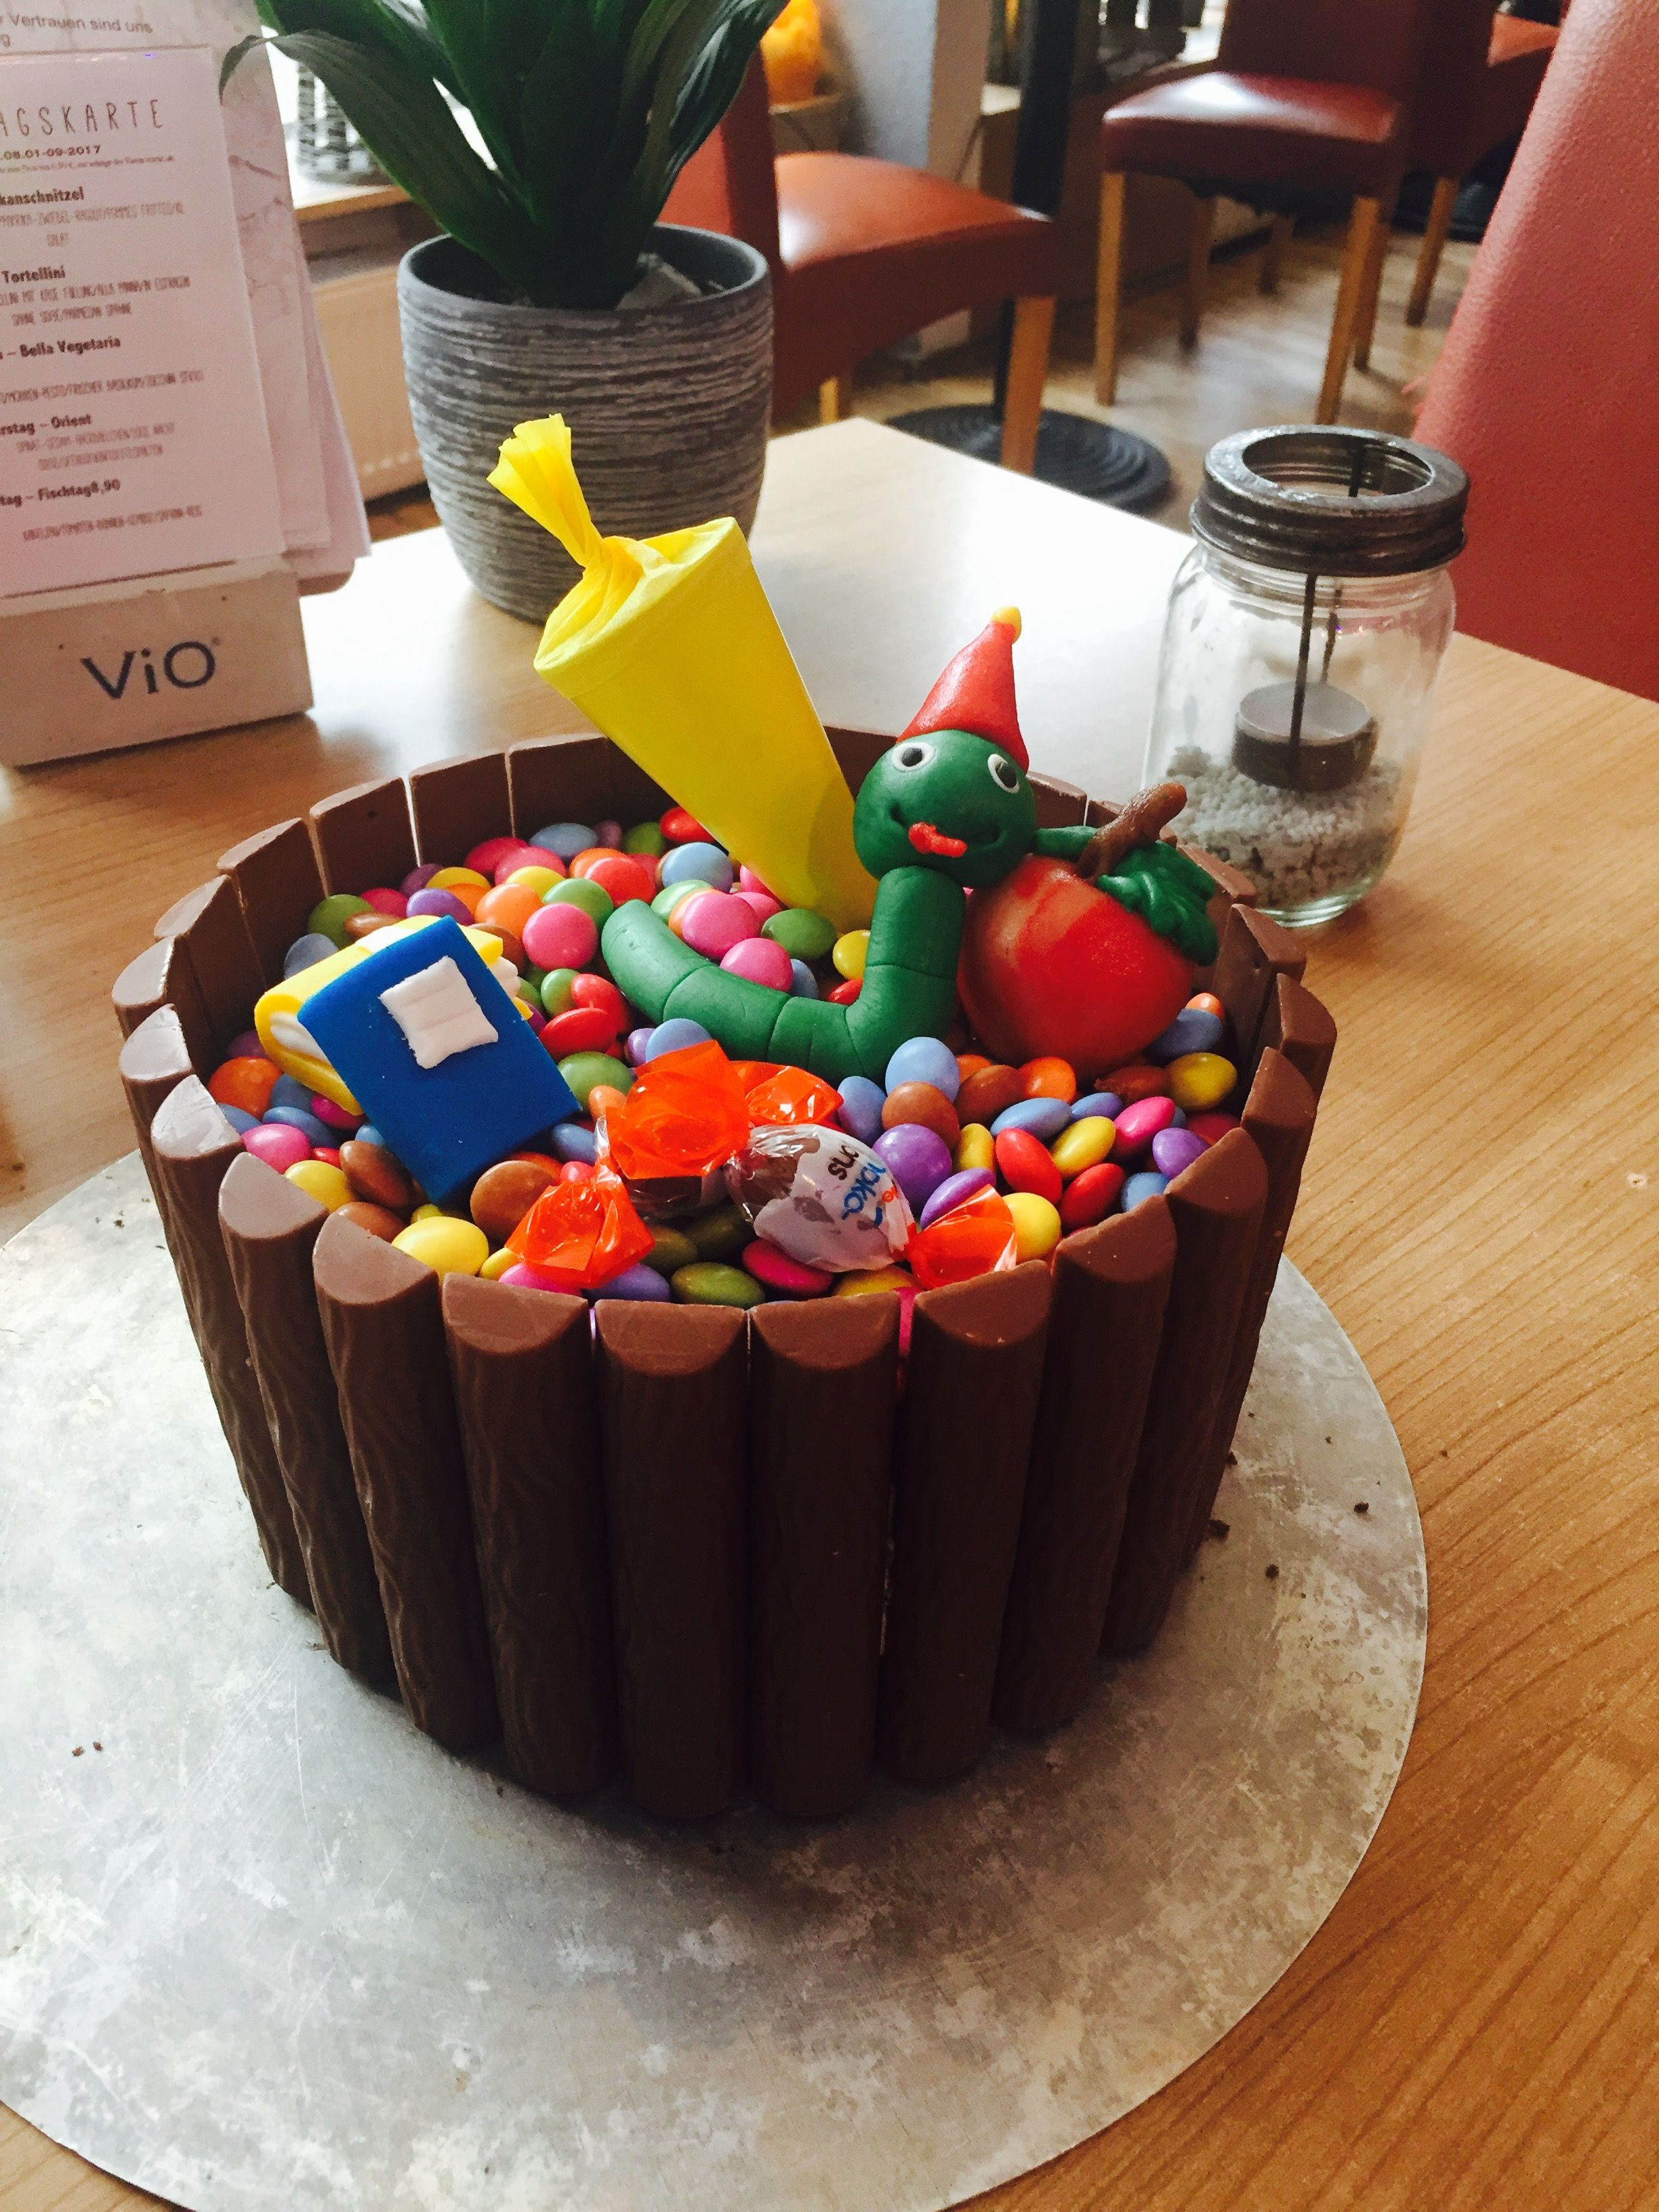 torte zur einschulung torte einschulung torten